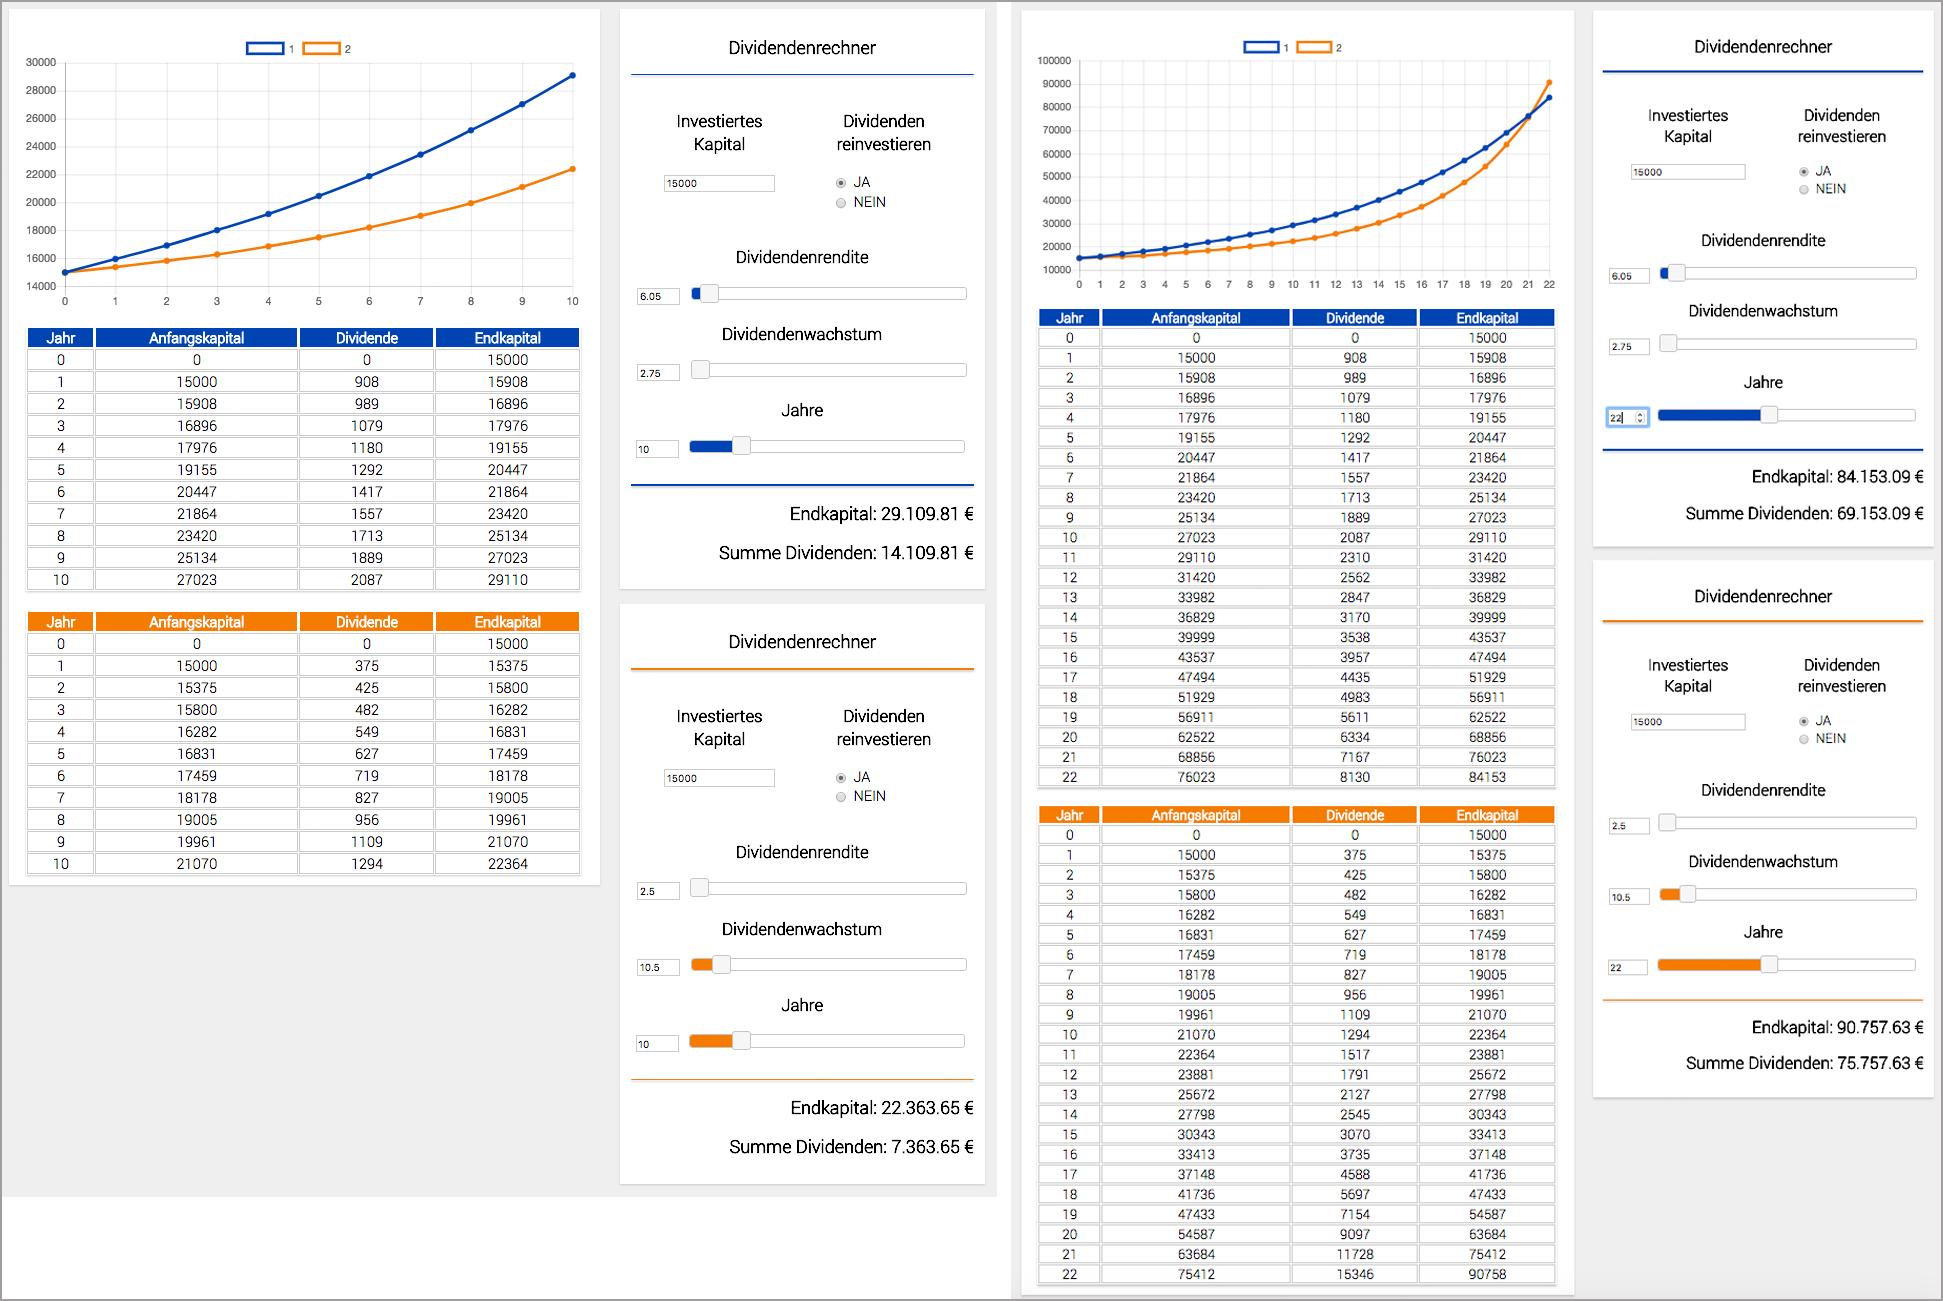 Dividenden-Rendite vs. Dividenden-Wachstum